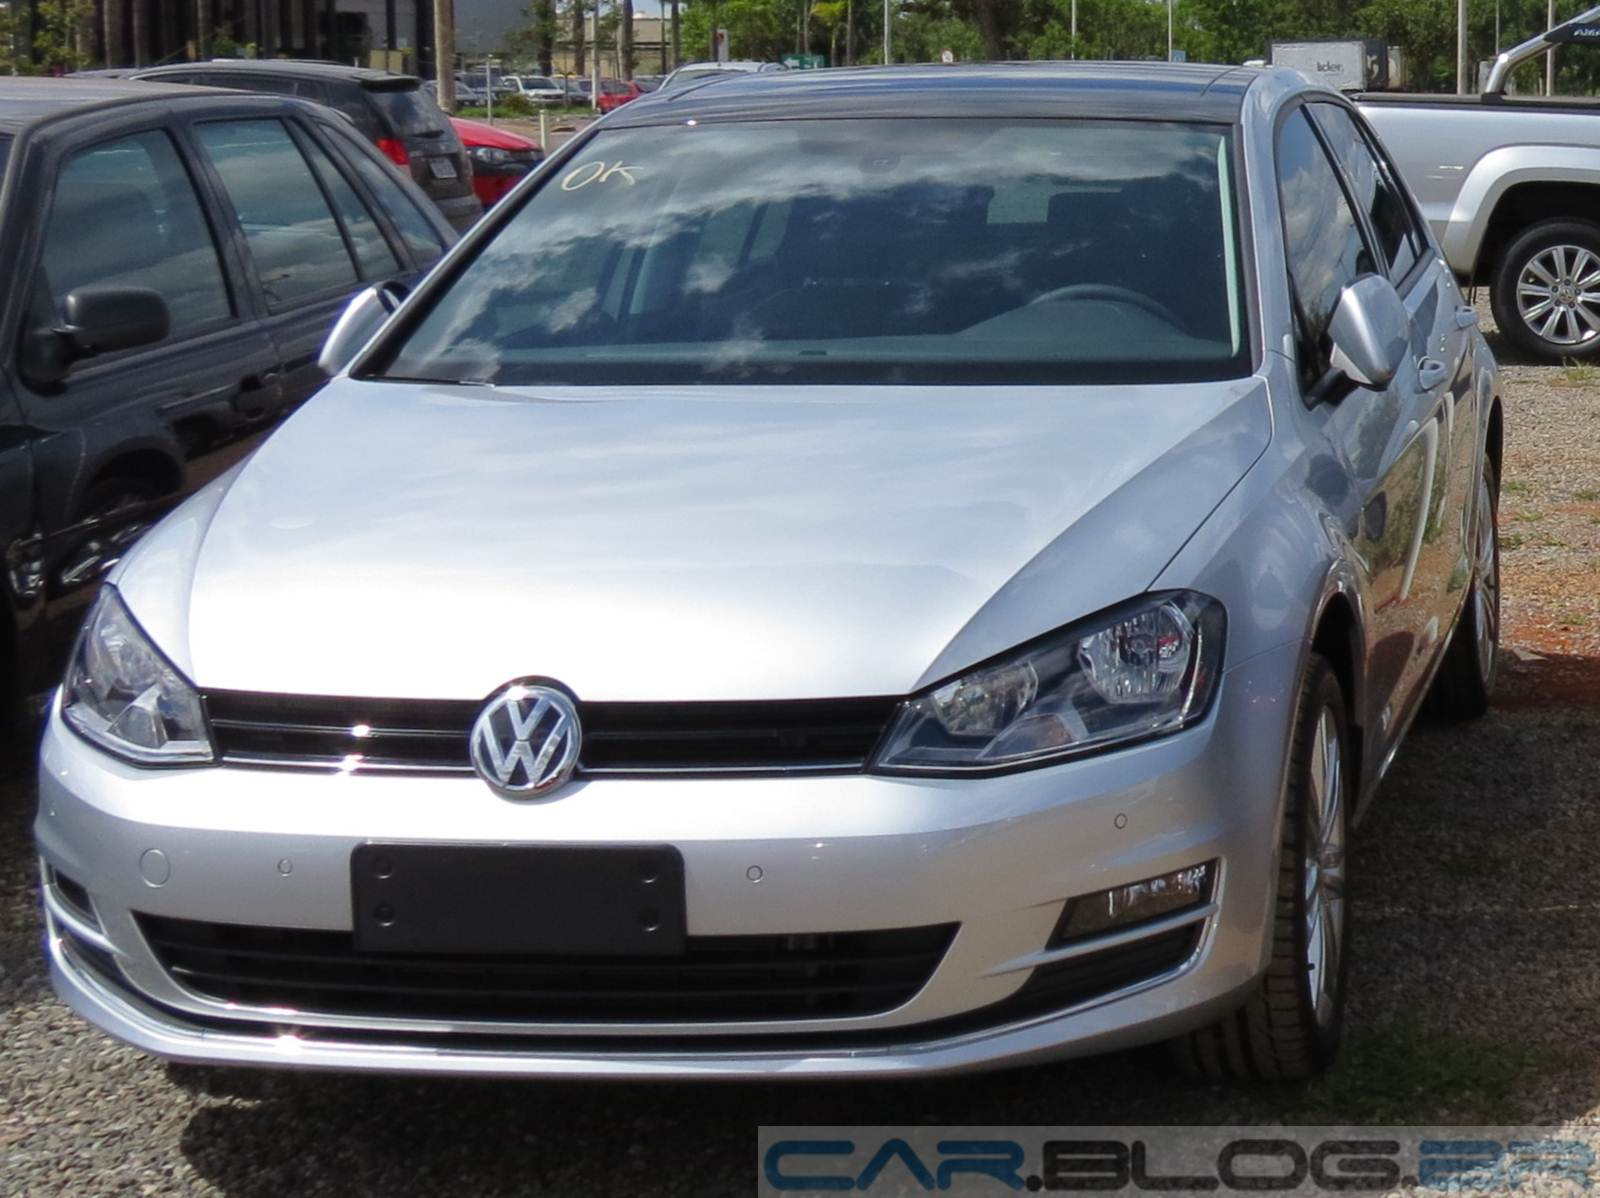 Novo VW Golf 2015 - Prata Sargas